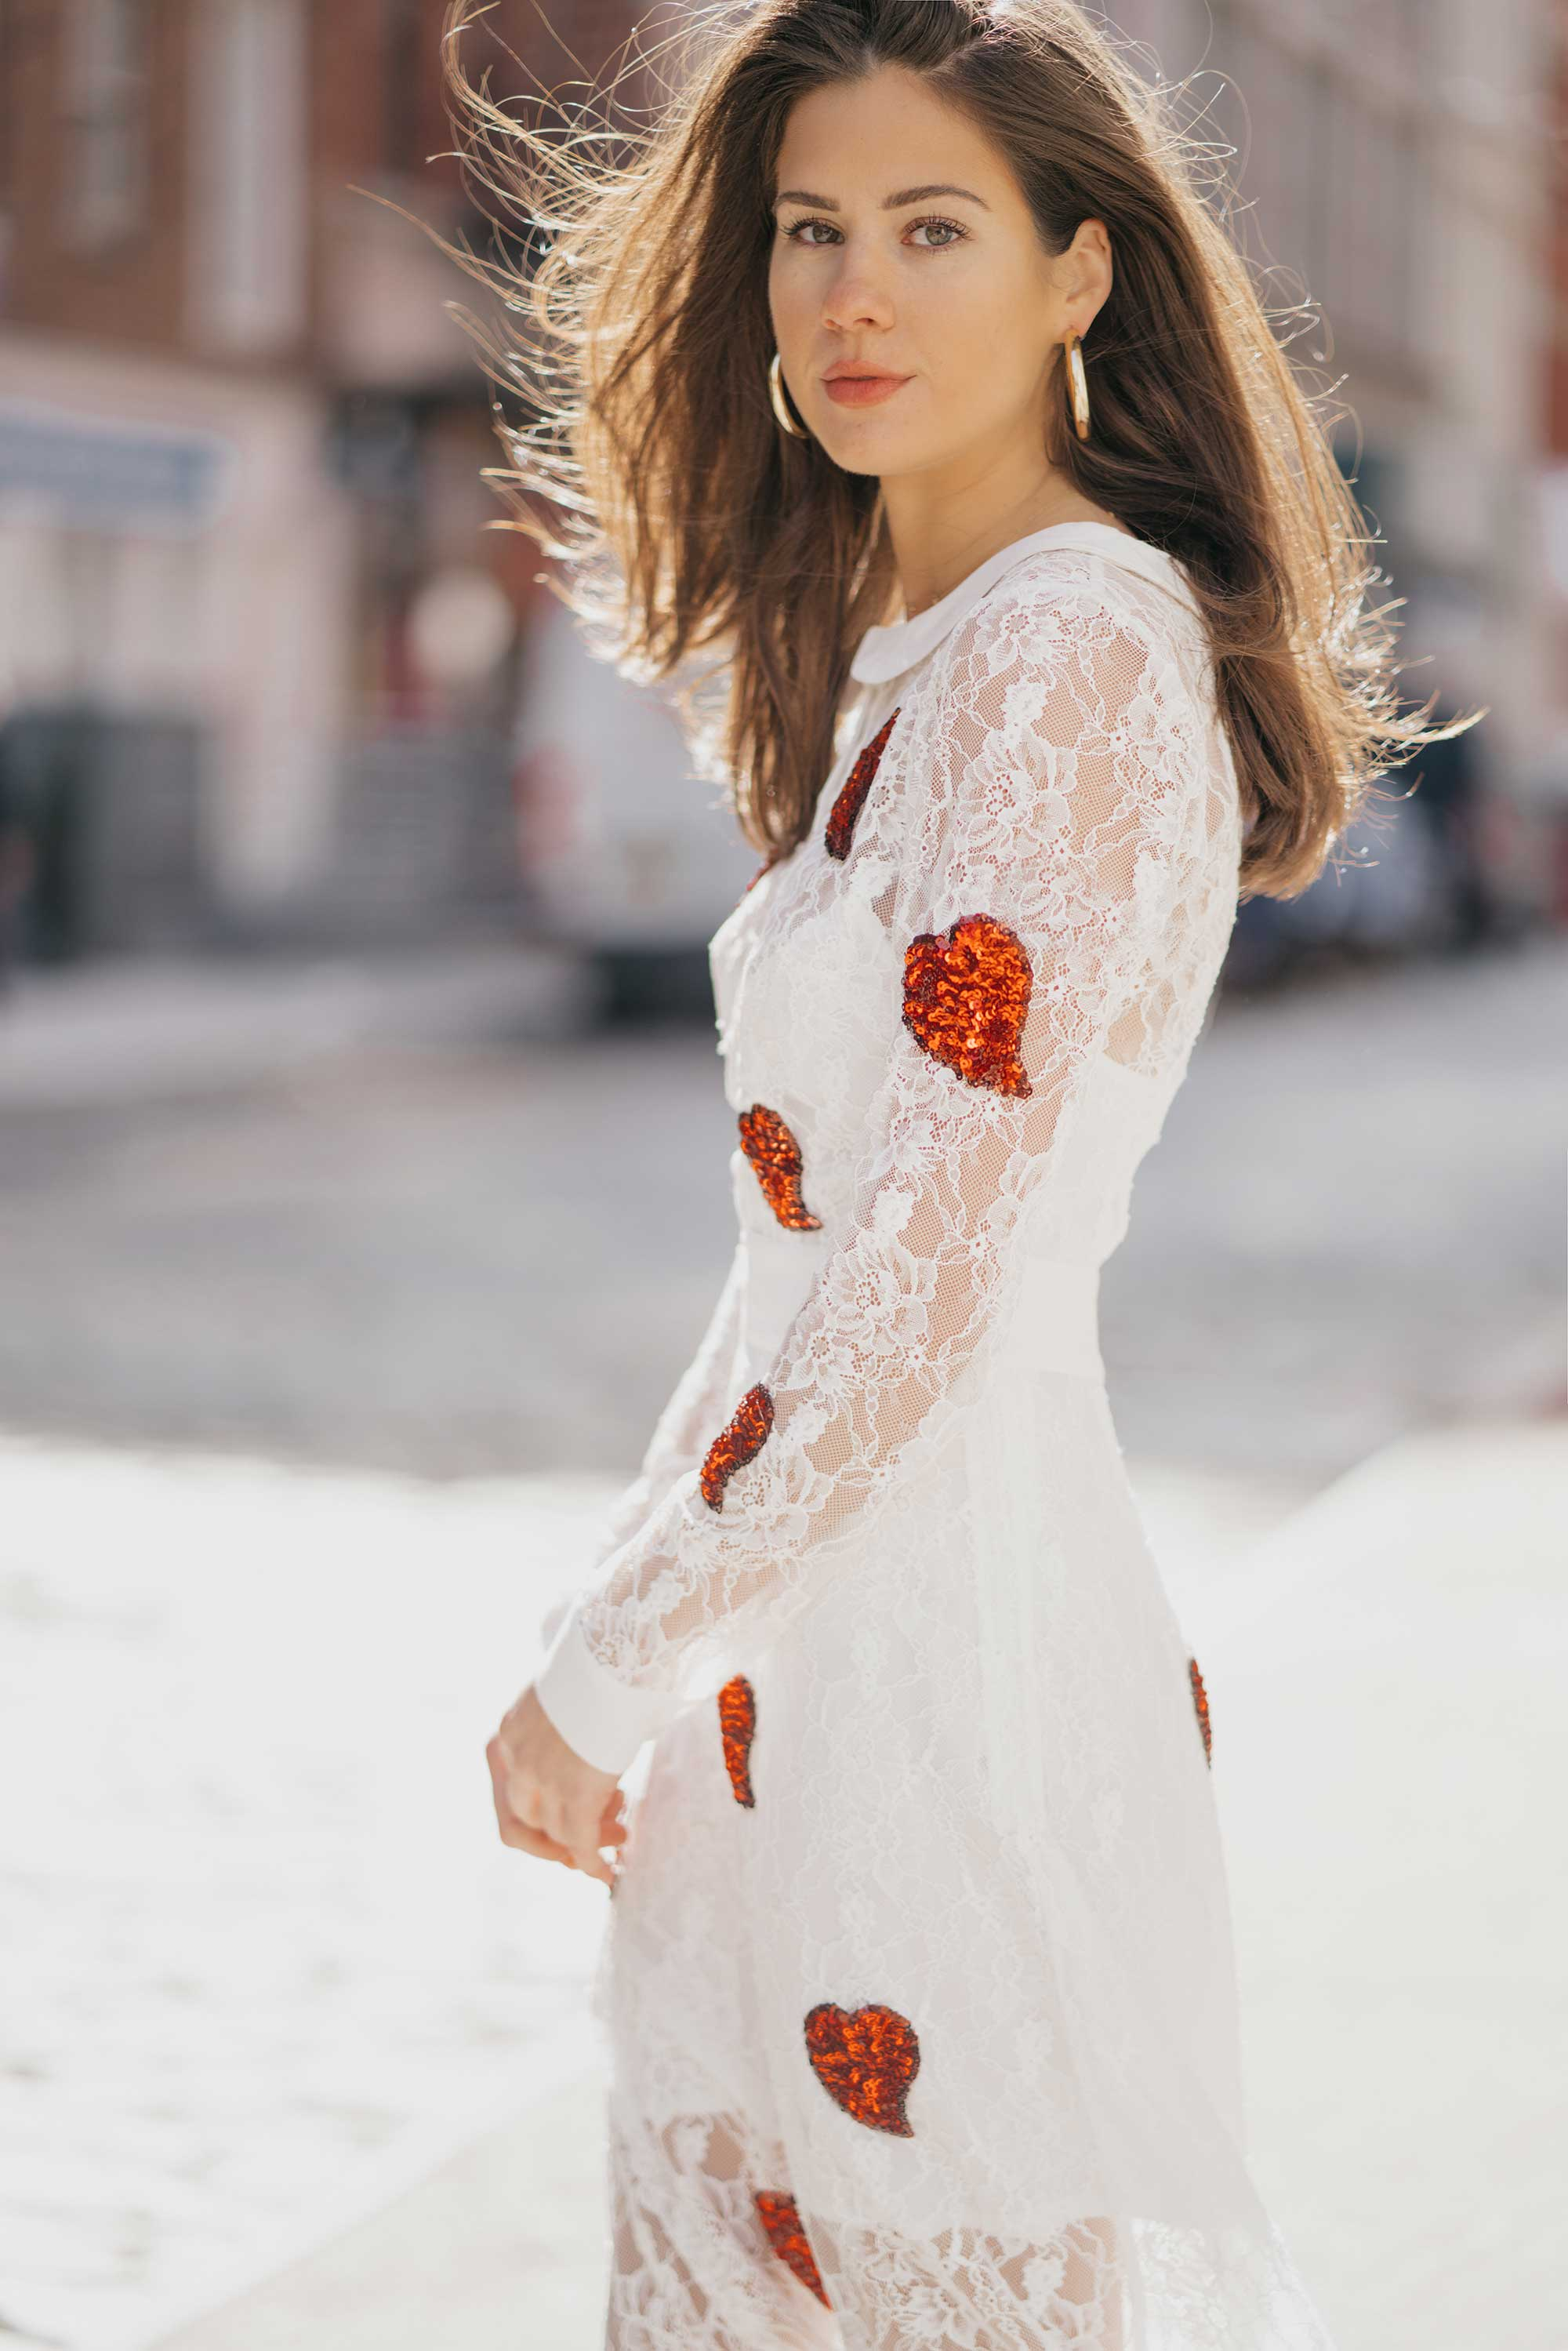 For-Love-and-Lemons-La-Zosia-Midi-Dress-Sheer-lace-sequin-heart-applique14.jpg